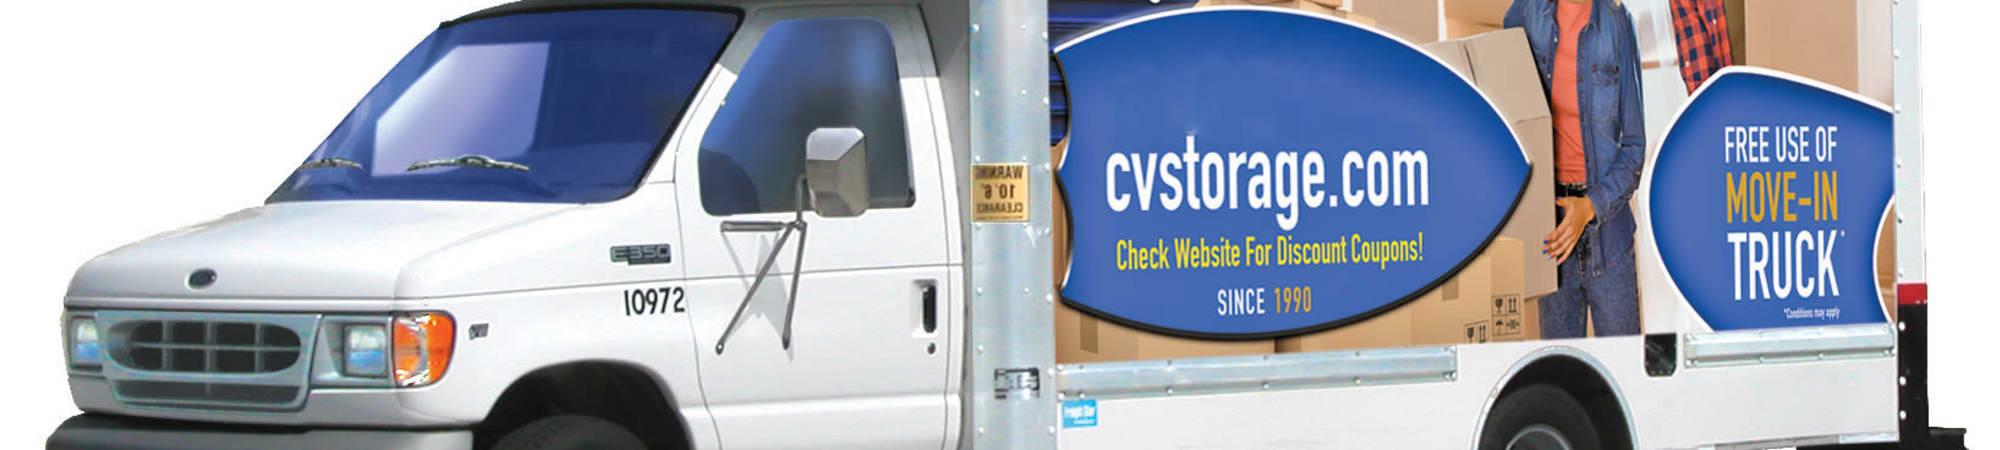 Free Move In Truck from Castro Valley Hayward Storage in Castro Valley, California